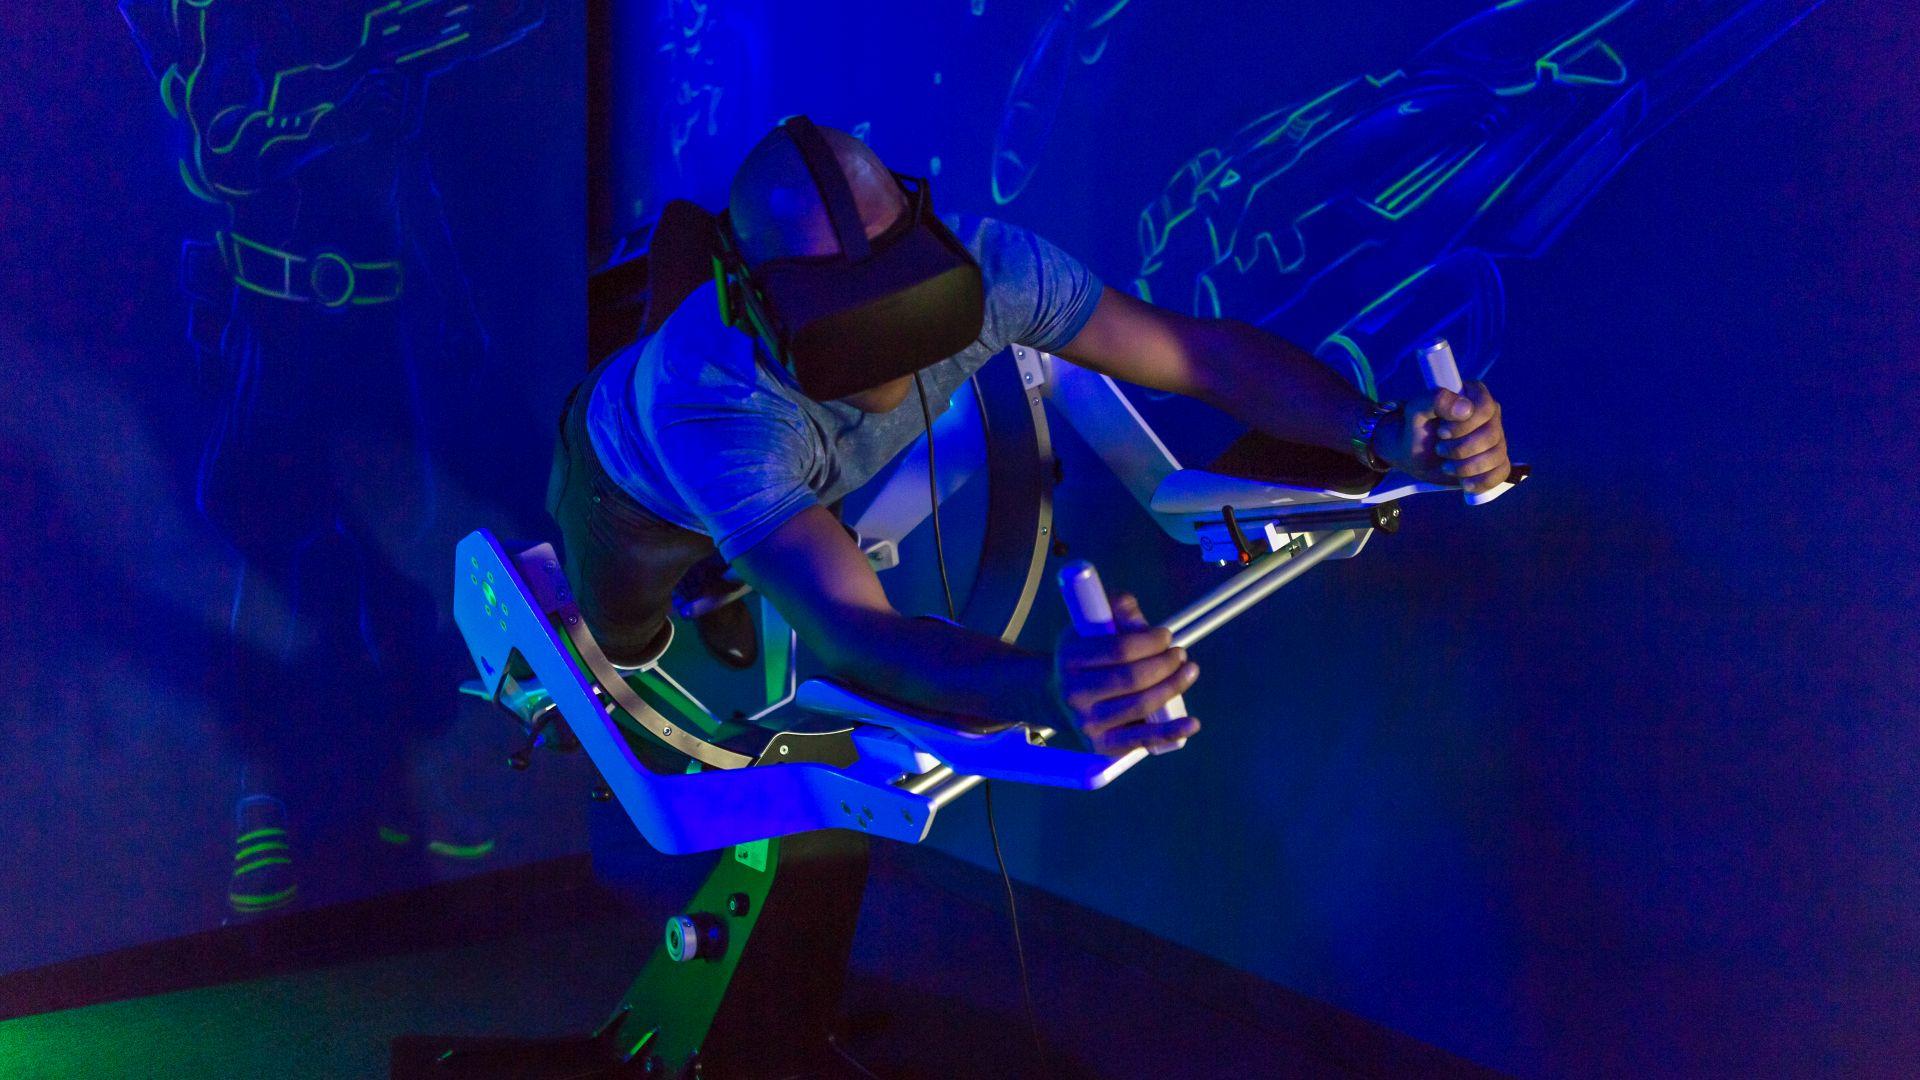 Icaros-man-Virtual-Reality